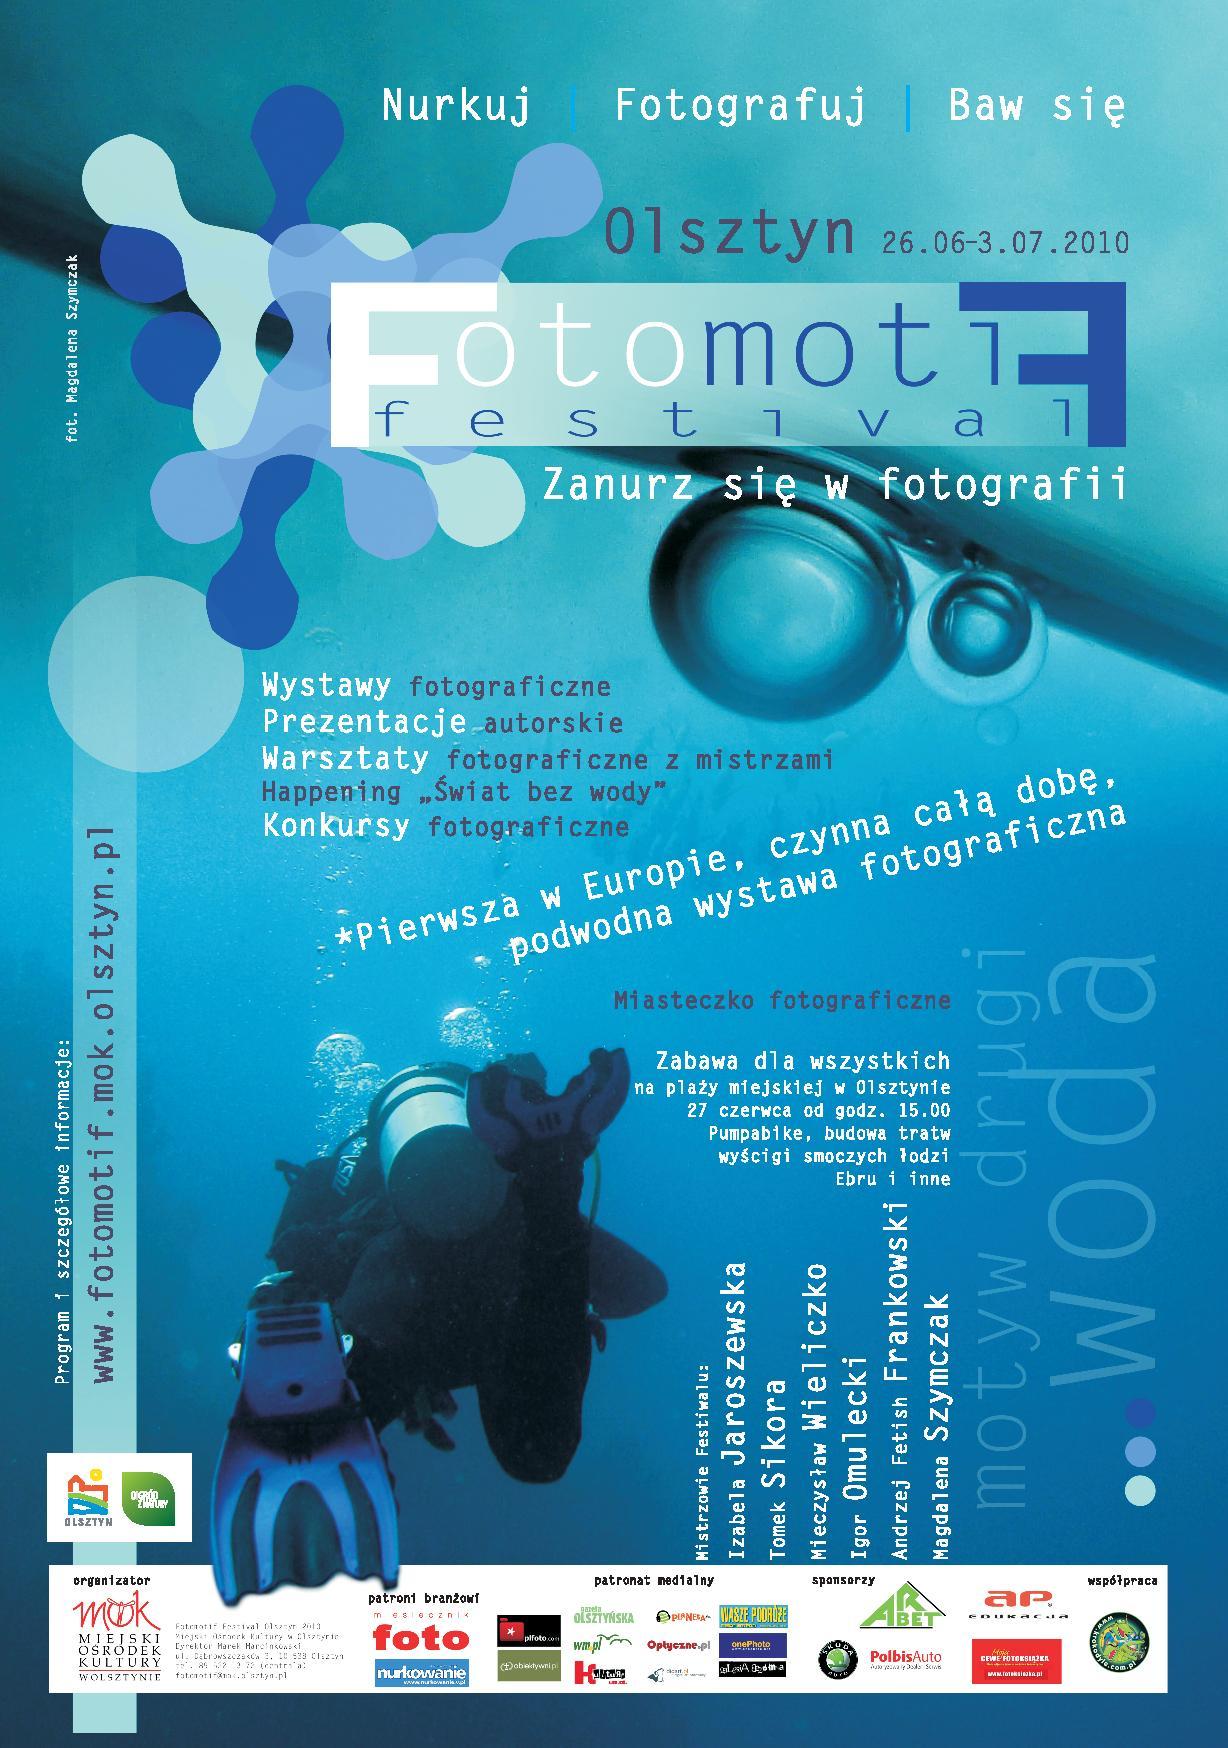 Fotomotif Festival 2009 3